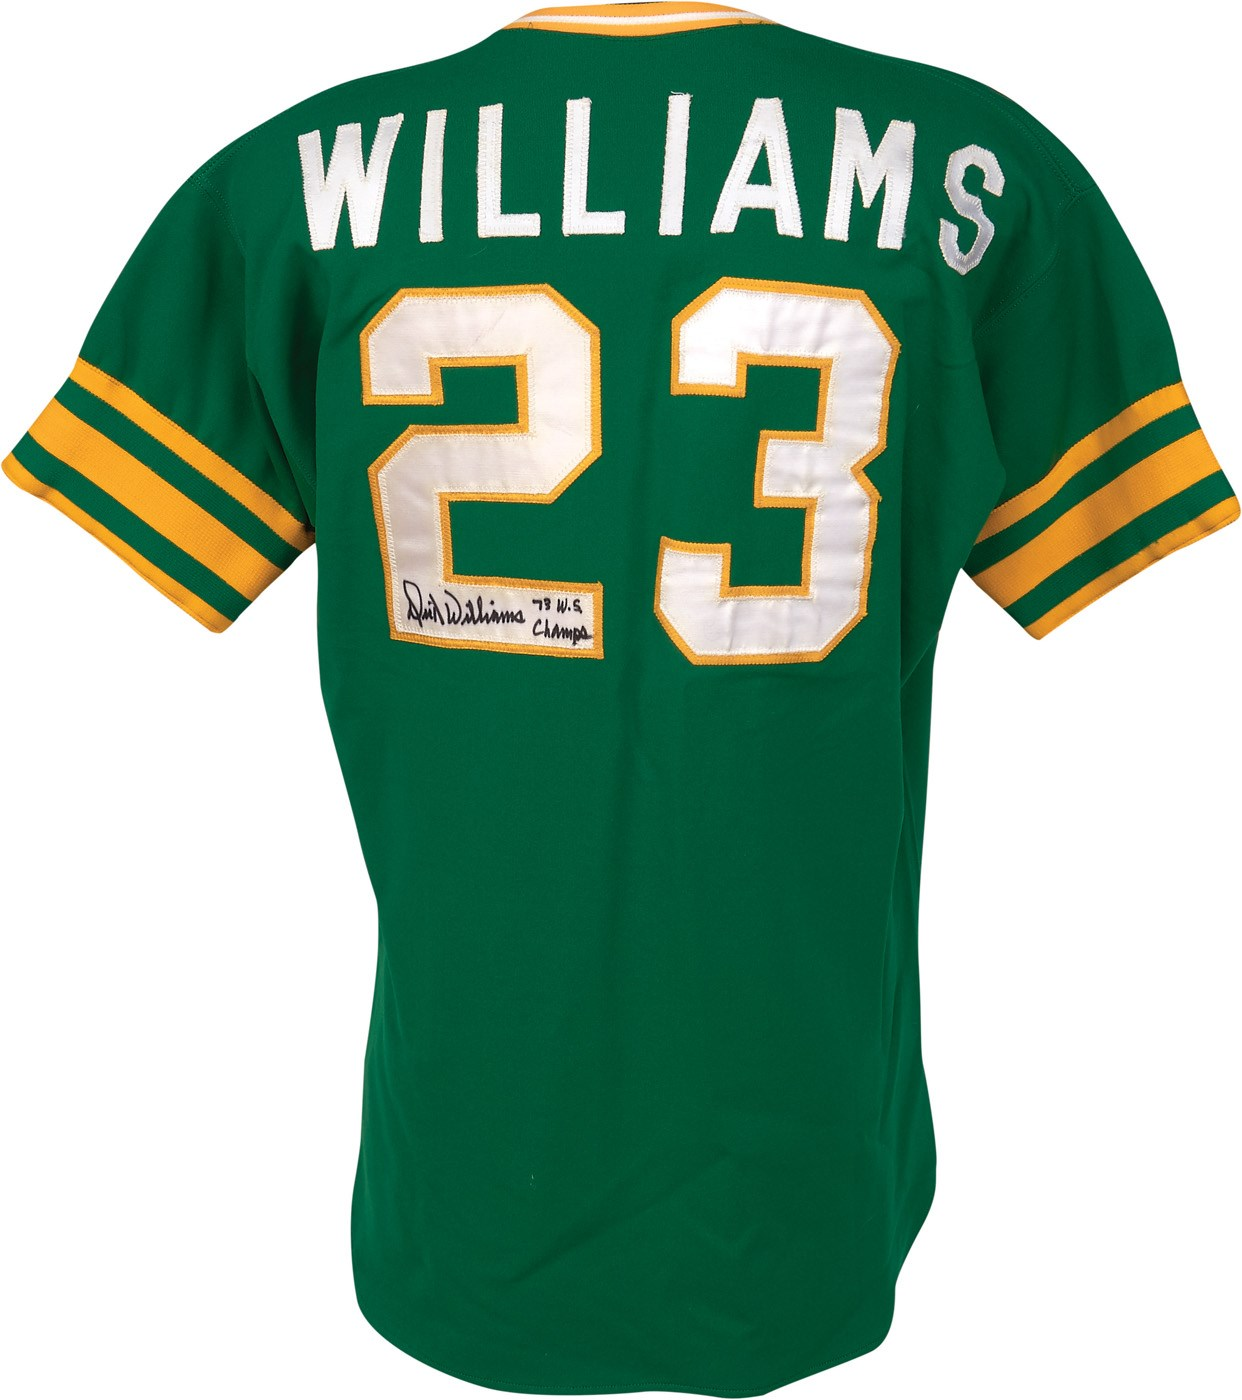 c8679cf9c66 1973 Dick Williams World Champion Oakland A s Game Worn Jersey